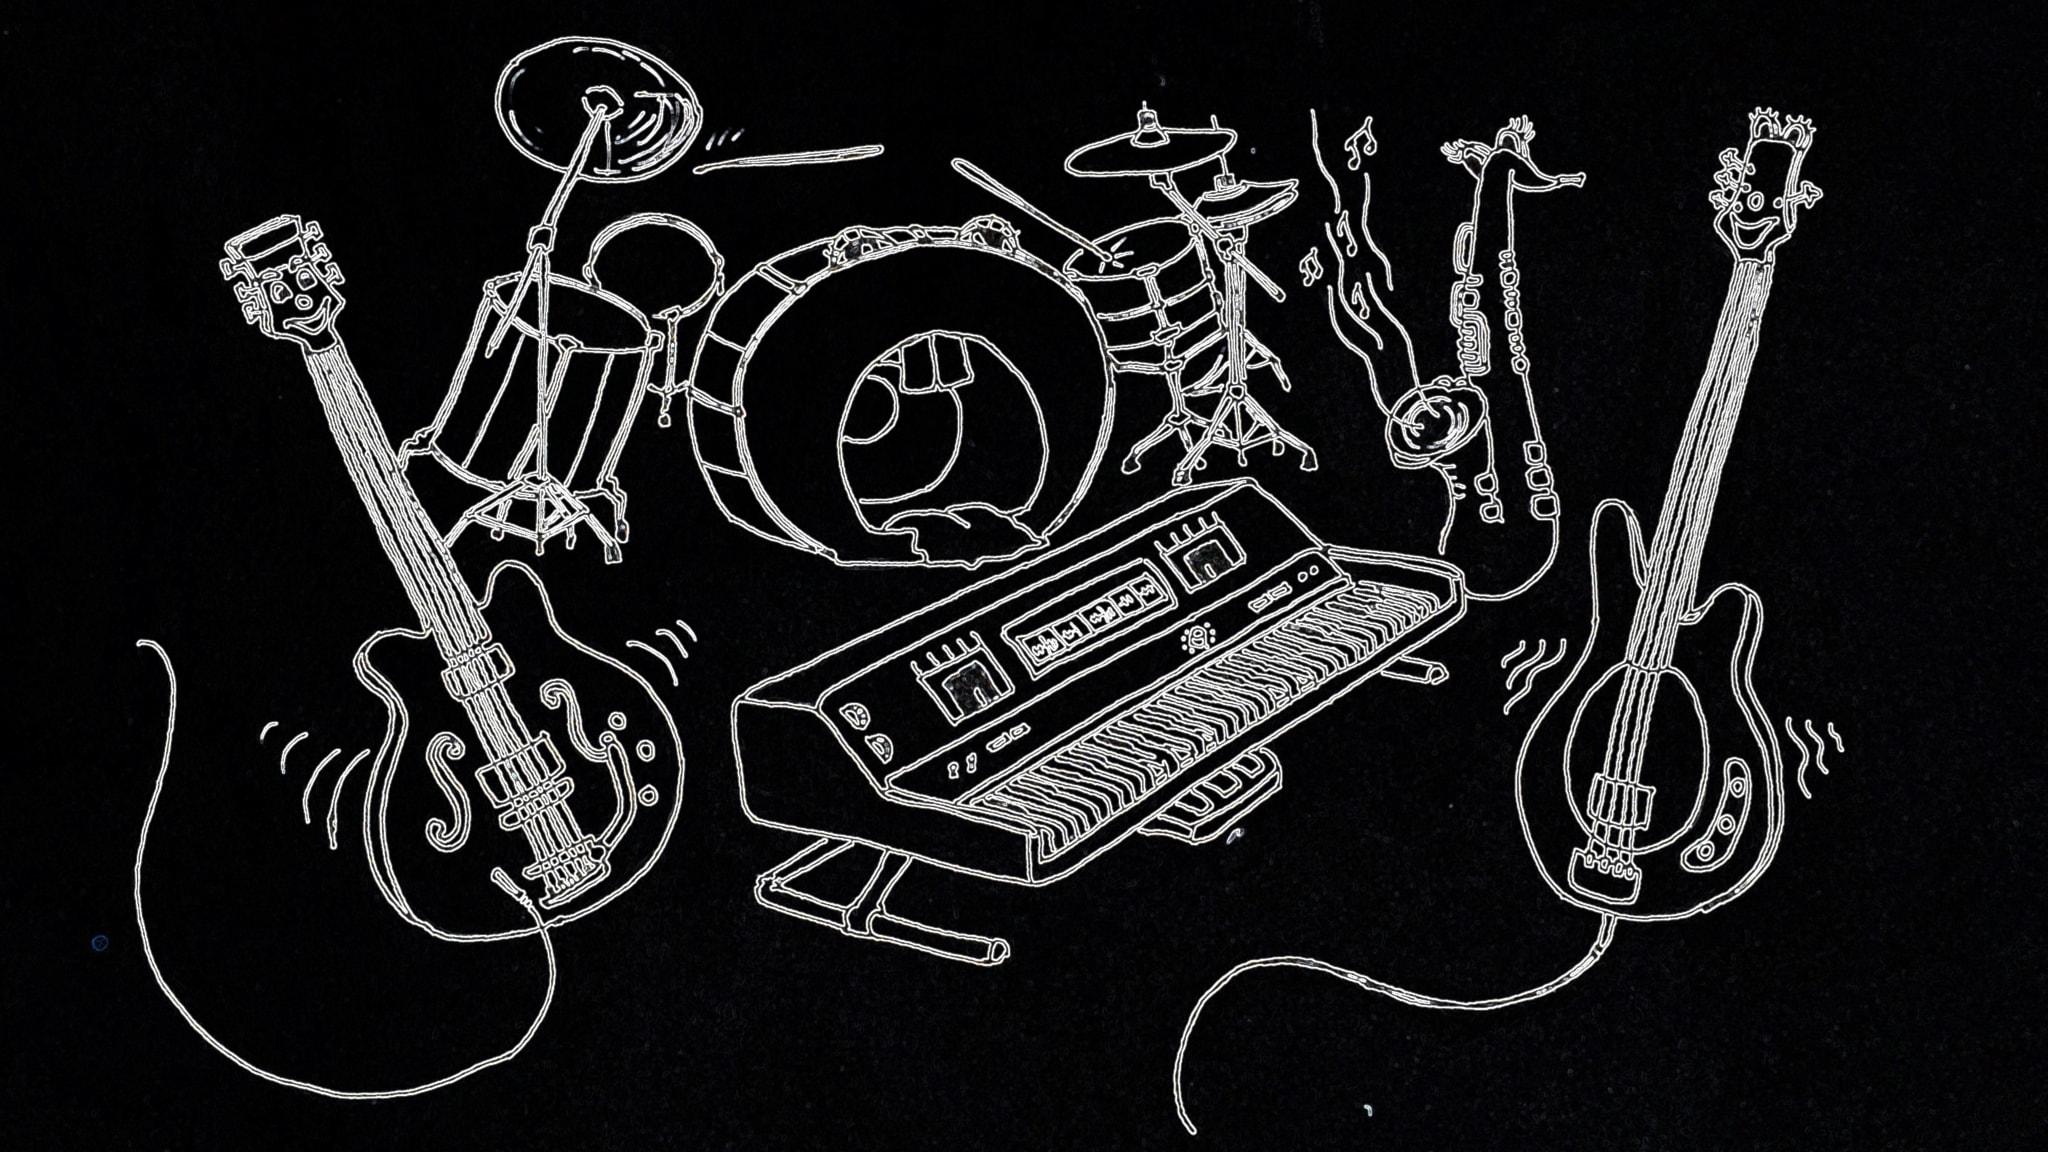 Satu: Bassokitaran bändi